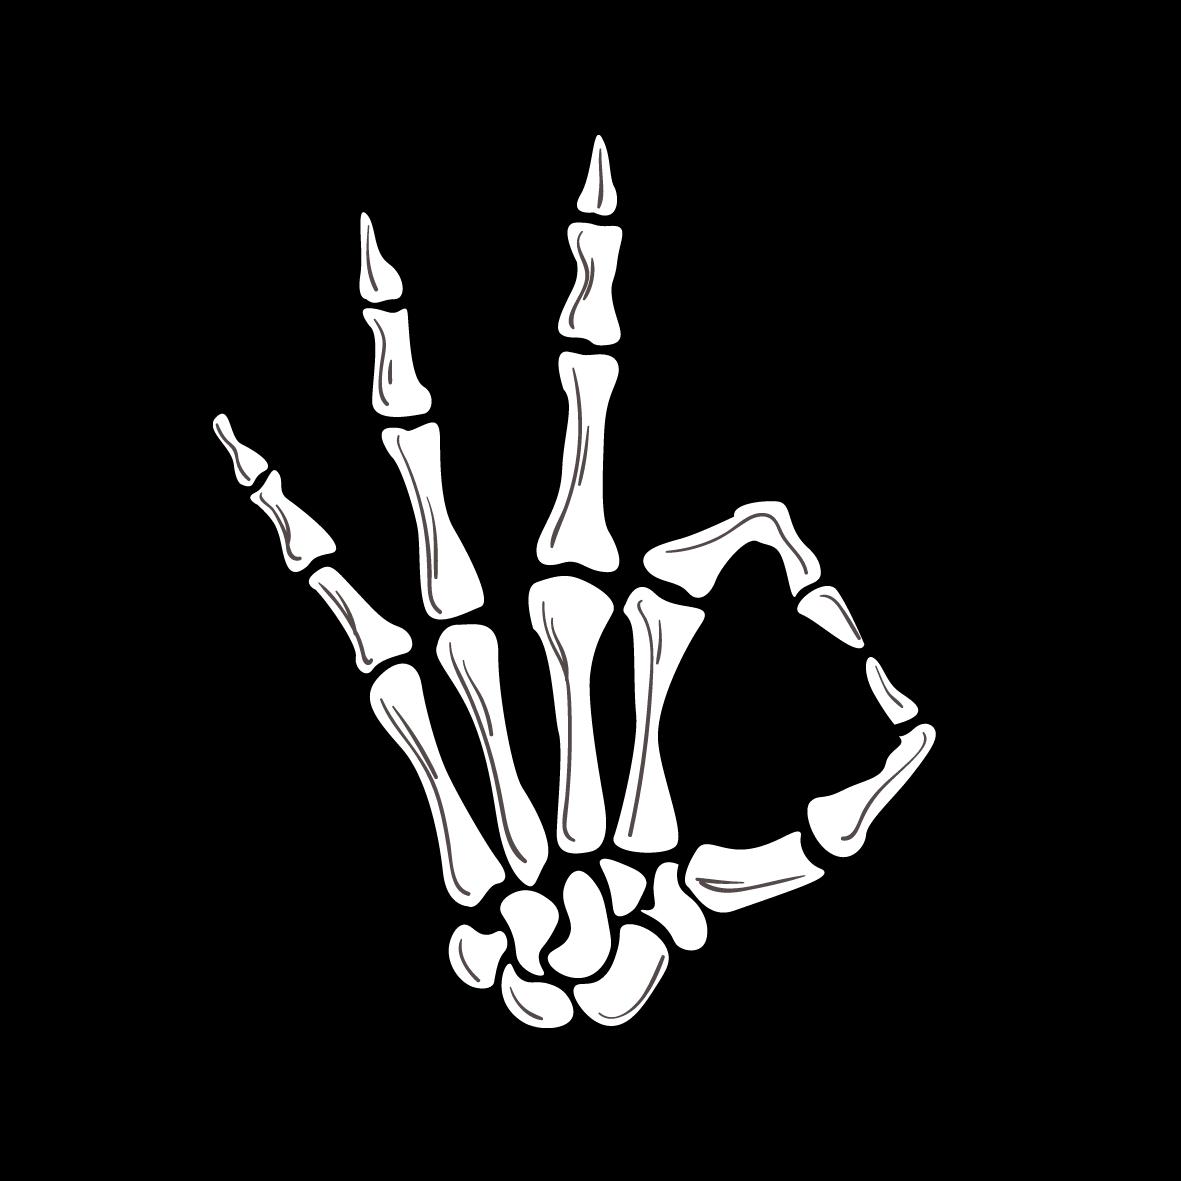 Skeleton Ok Hand Sticker Sticker By Zee09111 Skeleton Hands Drawing Hand Sticker Skeleton Art Drawing